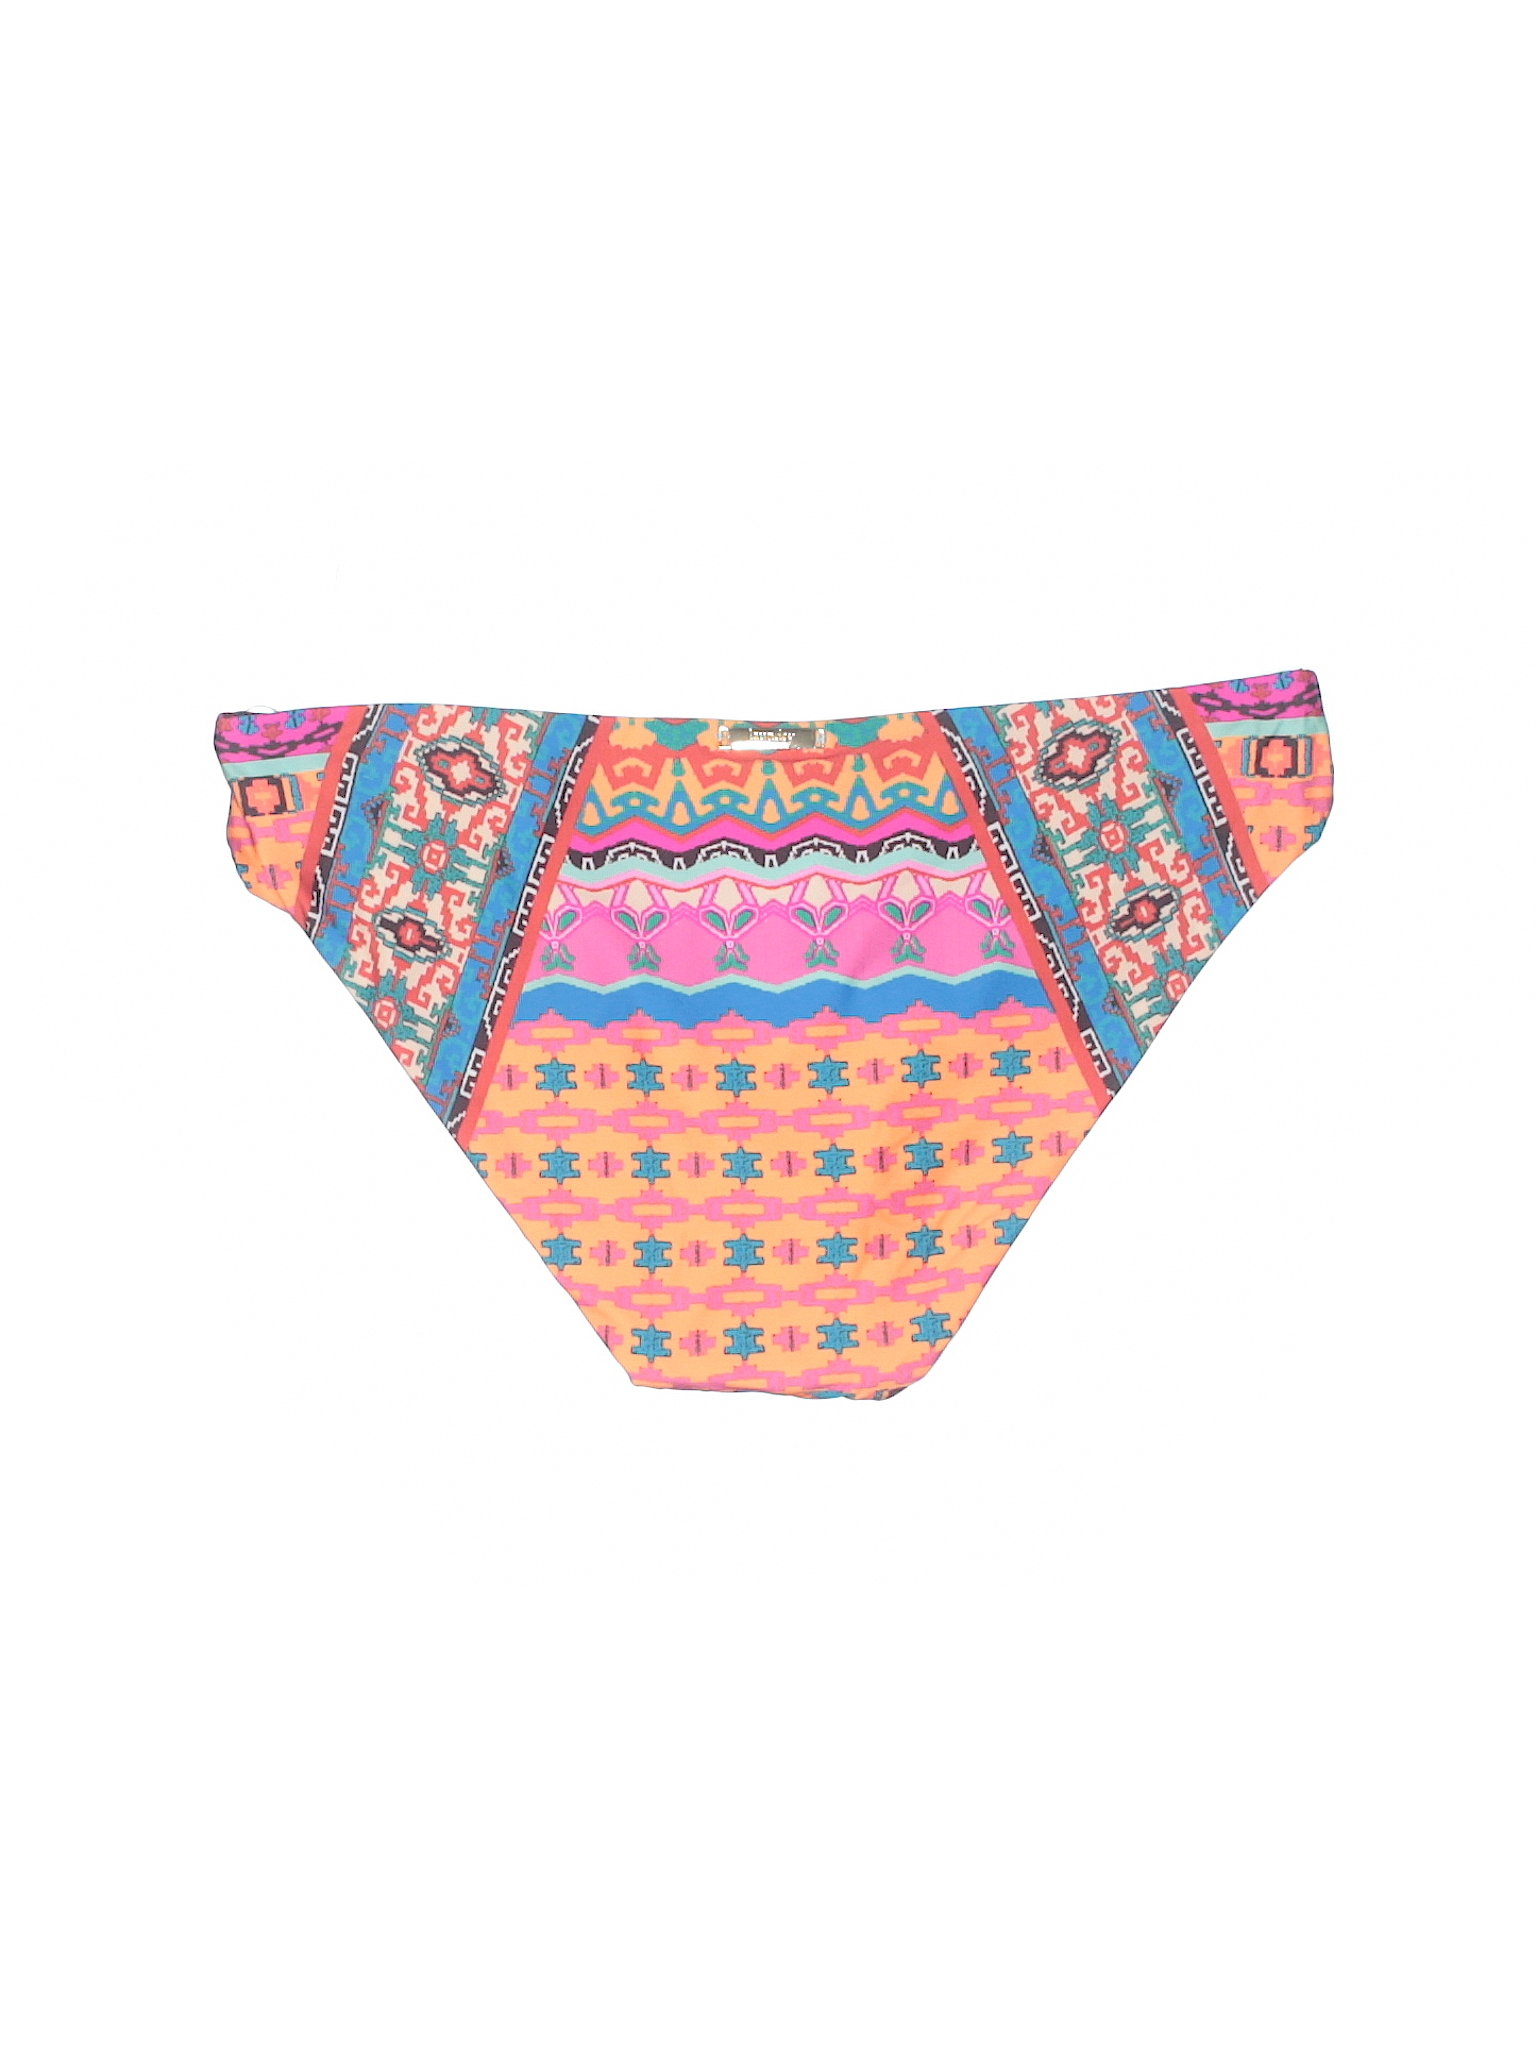 Swimsuit Bottoms Laundry By Shelli Segal Swimwear Teal